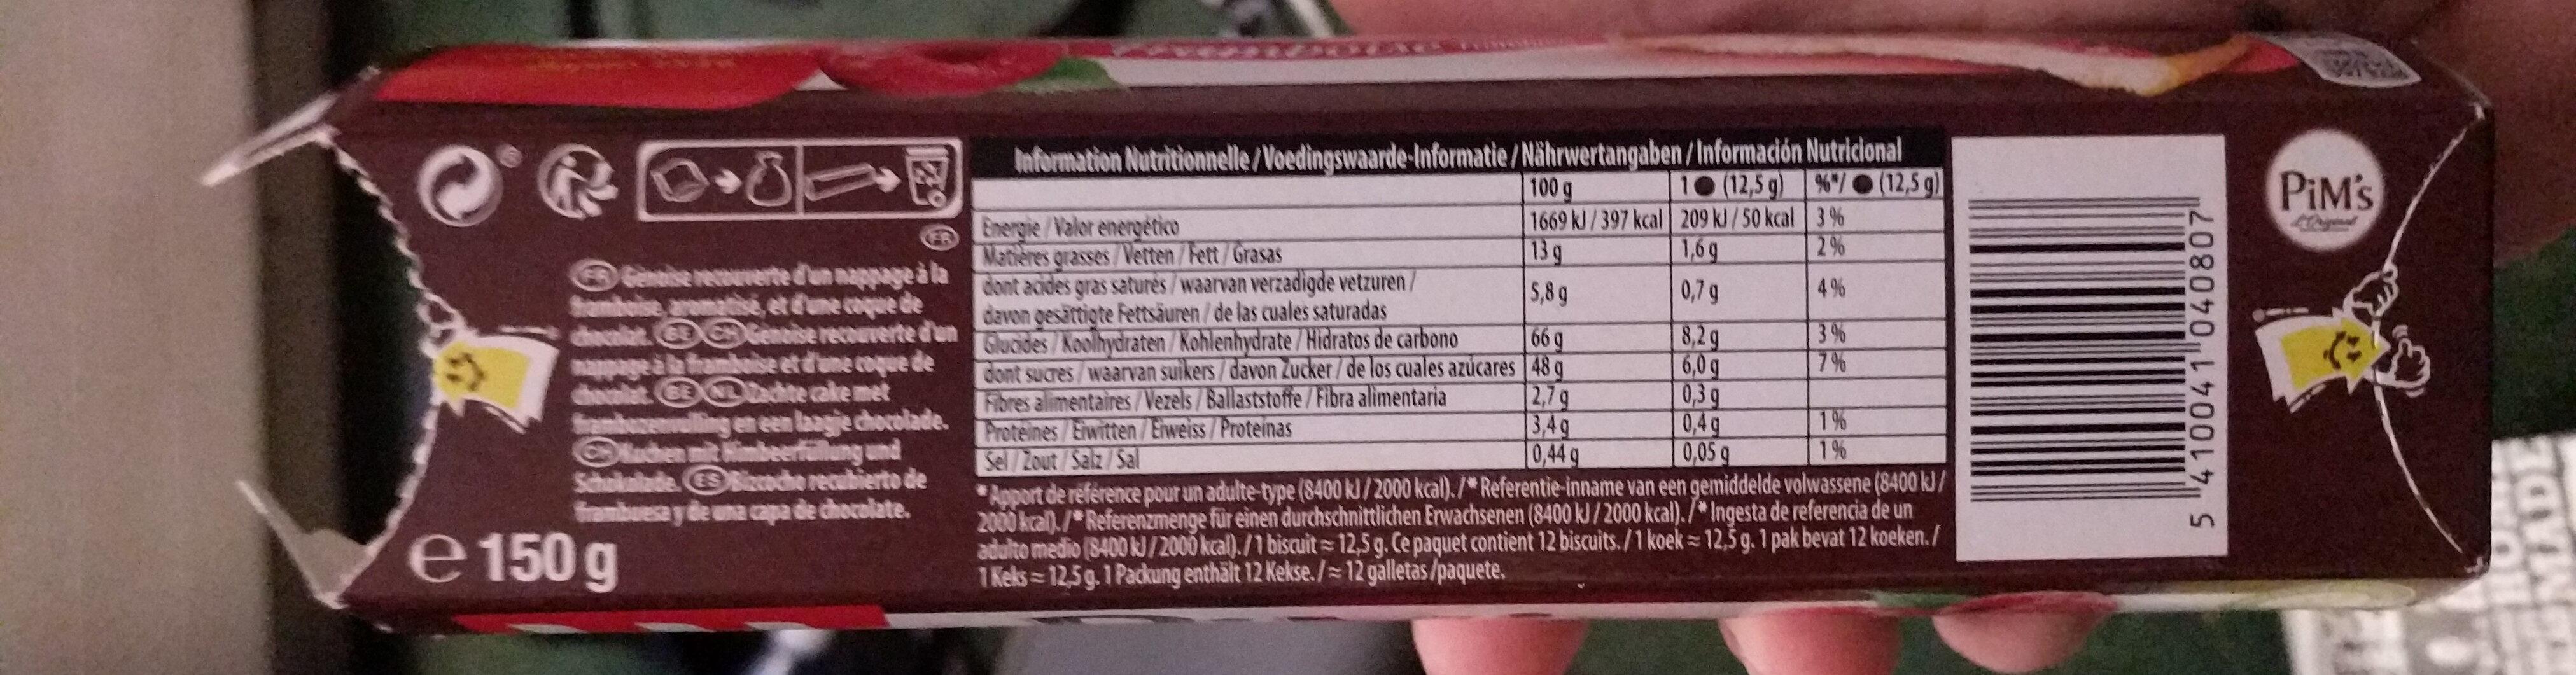 pims - Información nutricional - fr